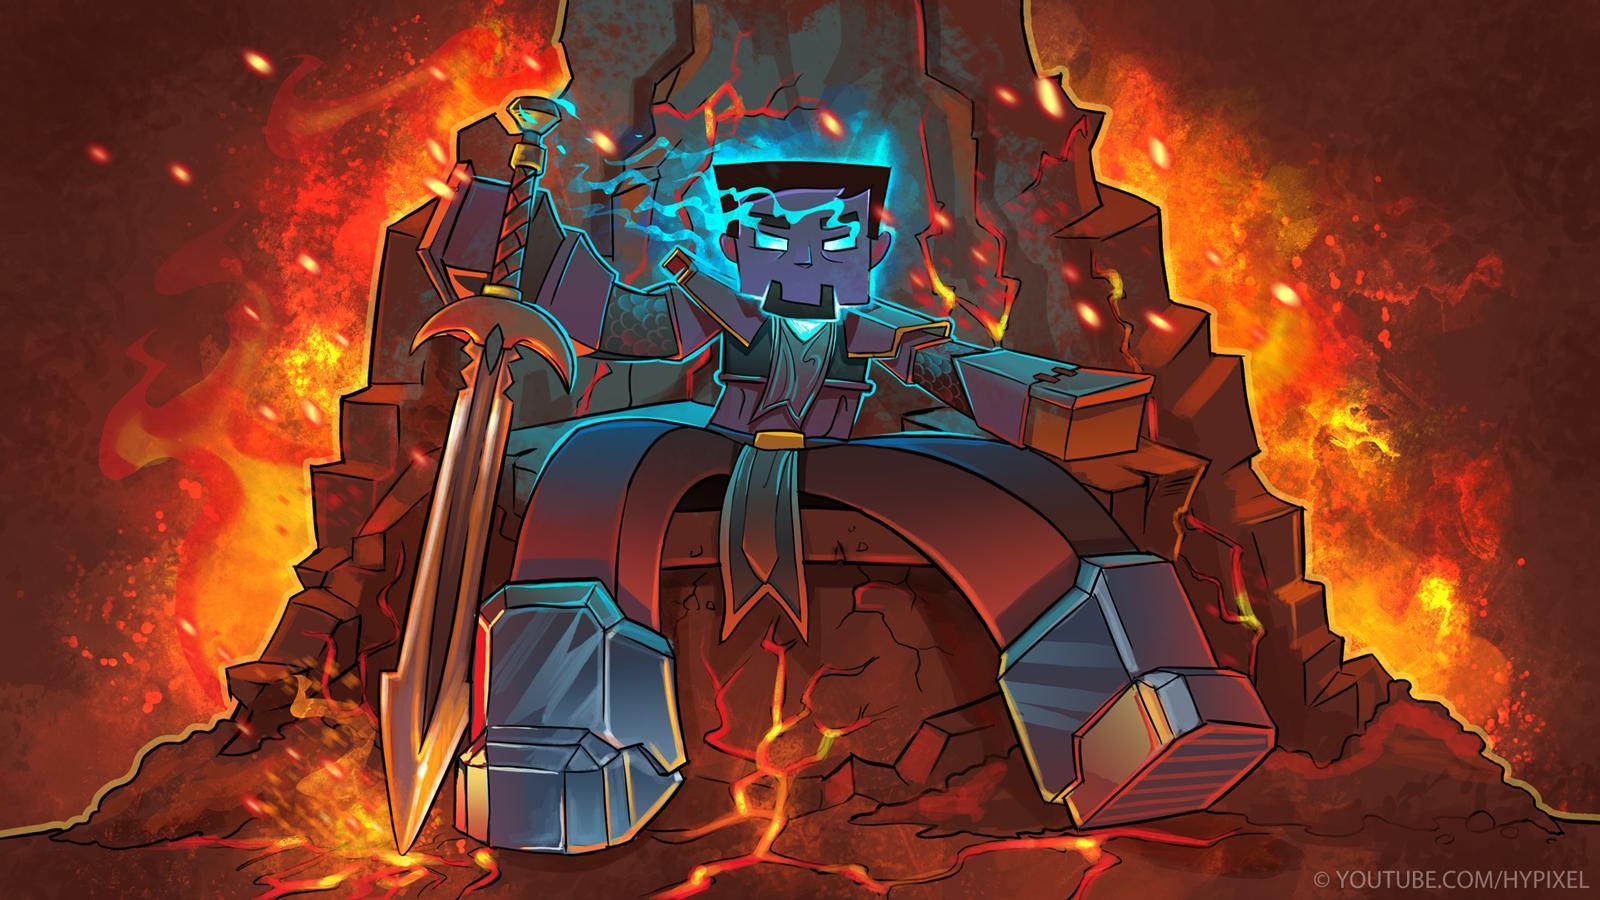 Beautiful Wallpaper Minecraft Youtube - amazing-minecraft-backgrounds-11  Image_48316.jpg